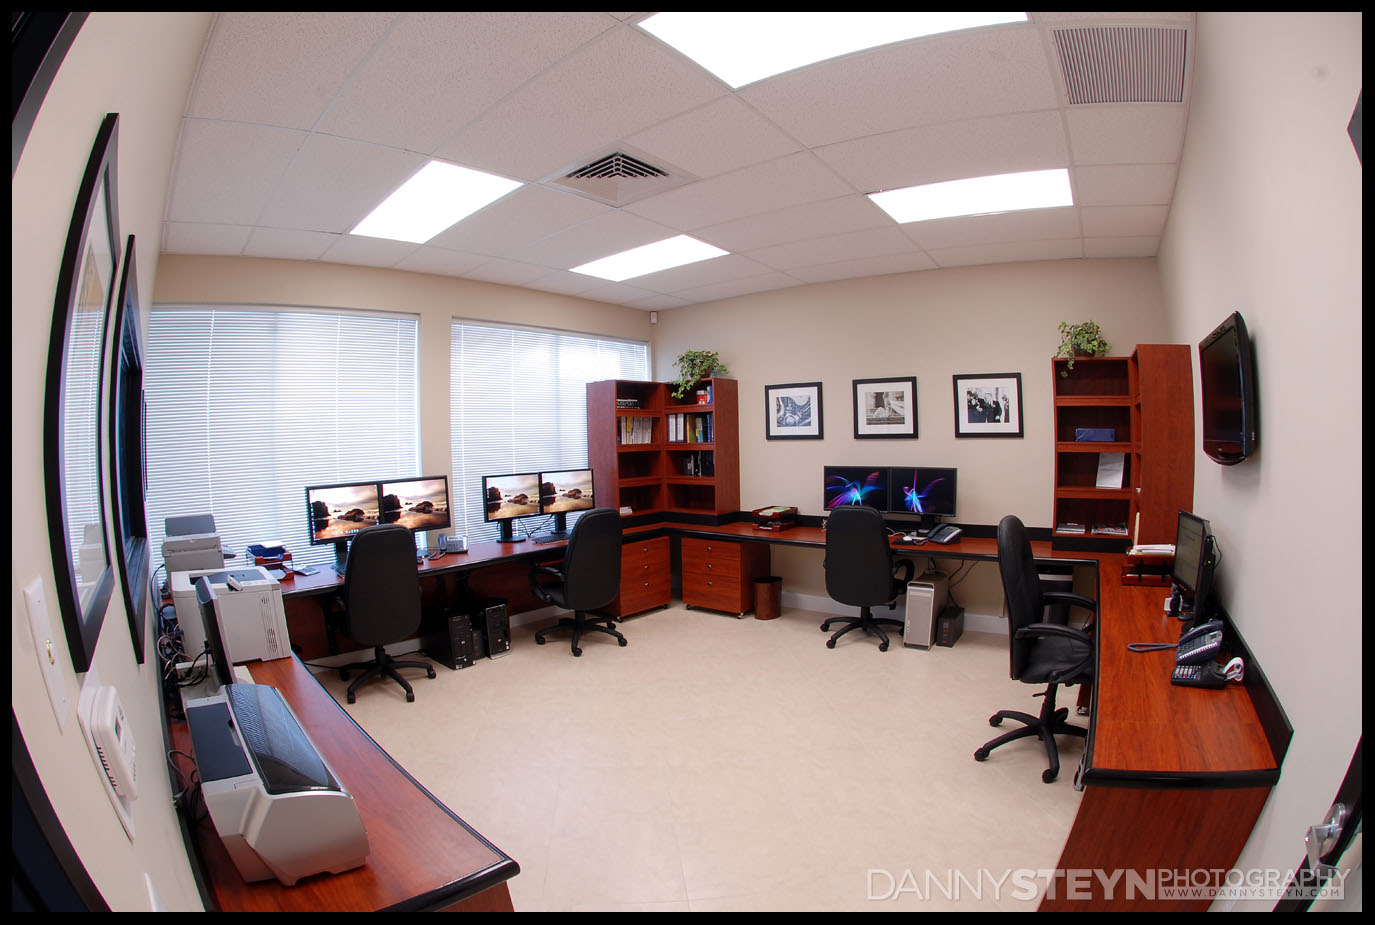 Adept Studios / Danny Steyn Photography Studio - 2006 - 2013